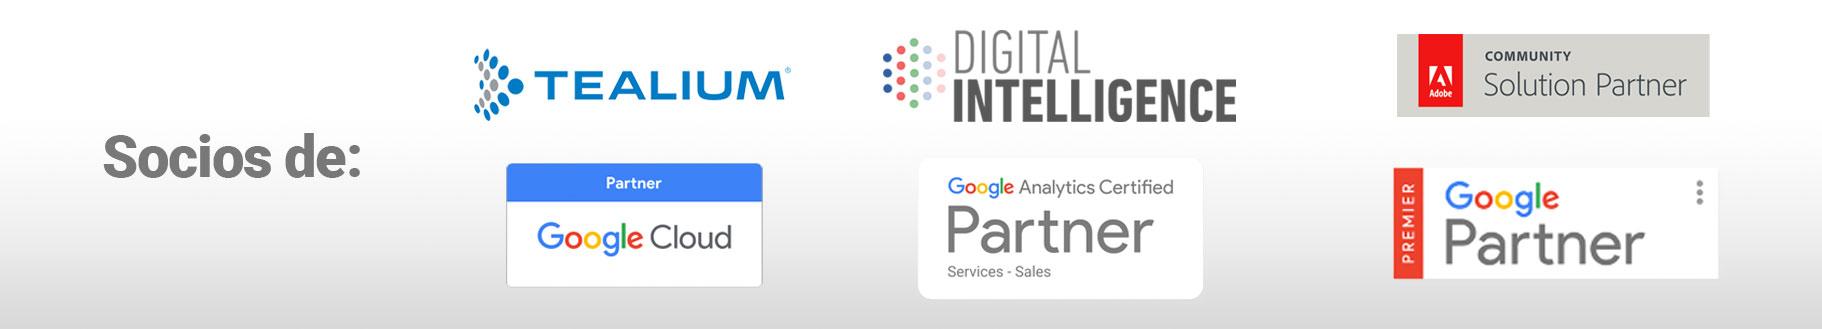 Google Analytics Cerified Partner